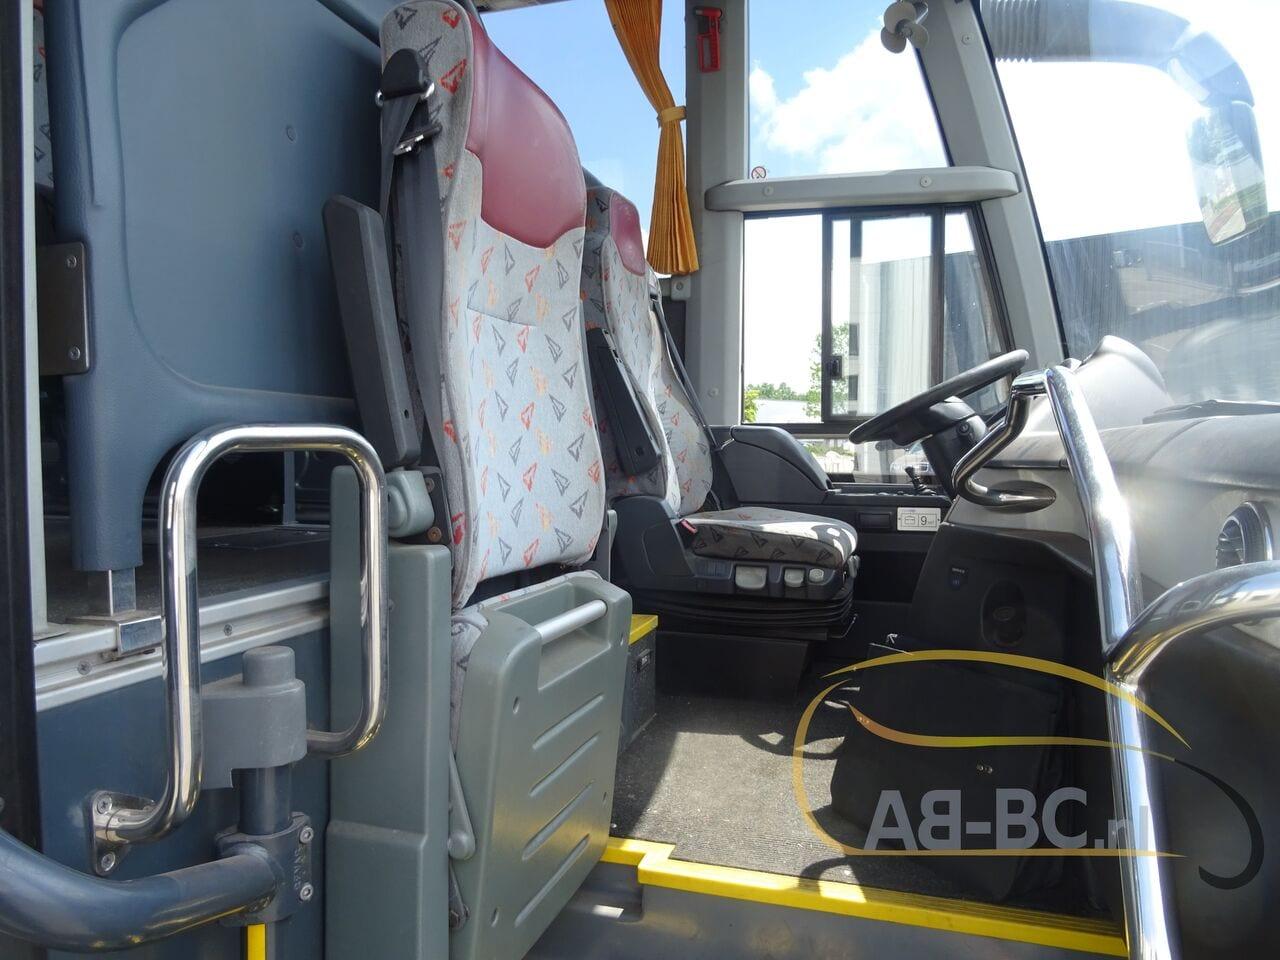 coach-busTEMSA-Safari-RD-DAF-Motor-53-Seats-Euro-5---1623932350005344183_big_6a149b23fc3651cedf442443578d7e92--21061715155620919600